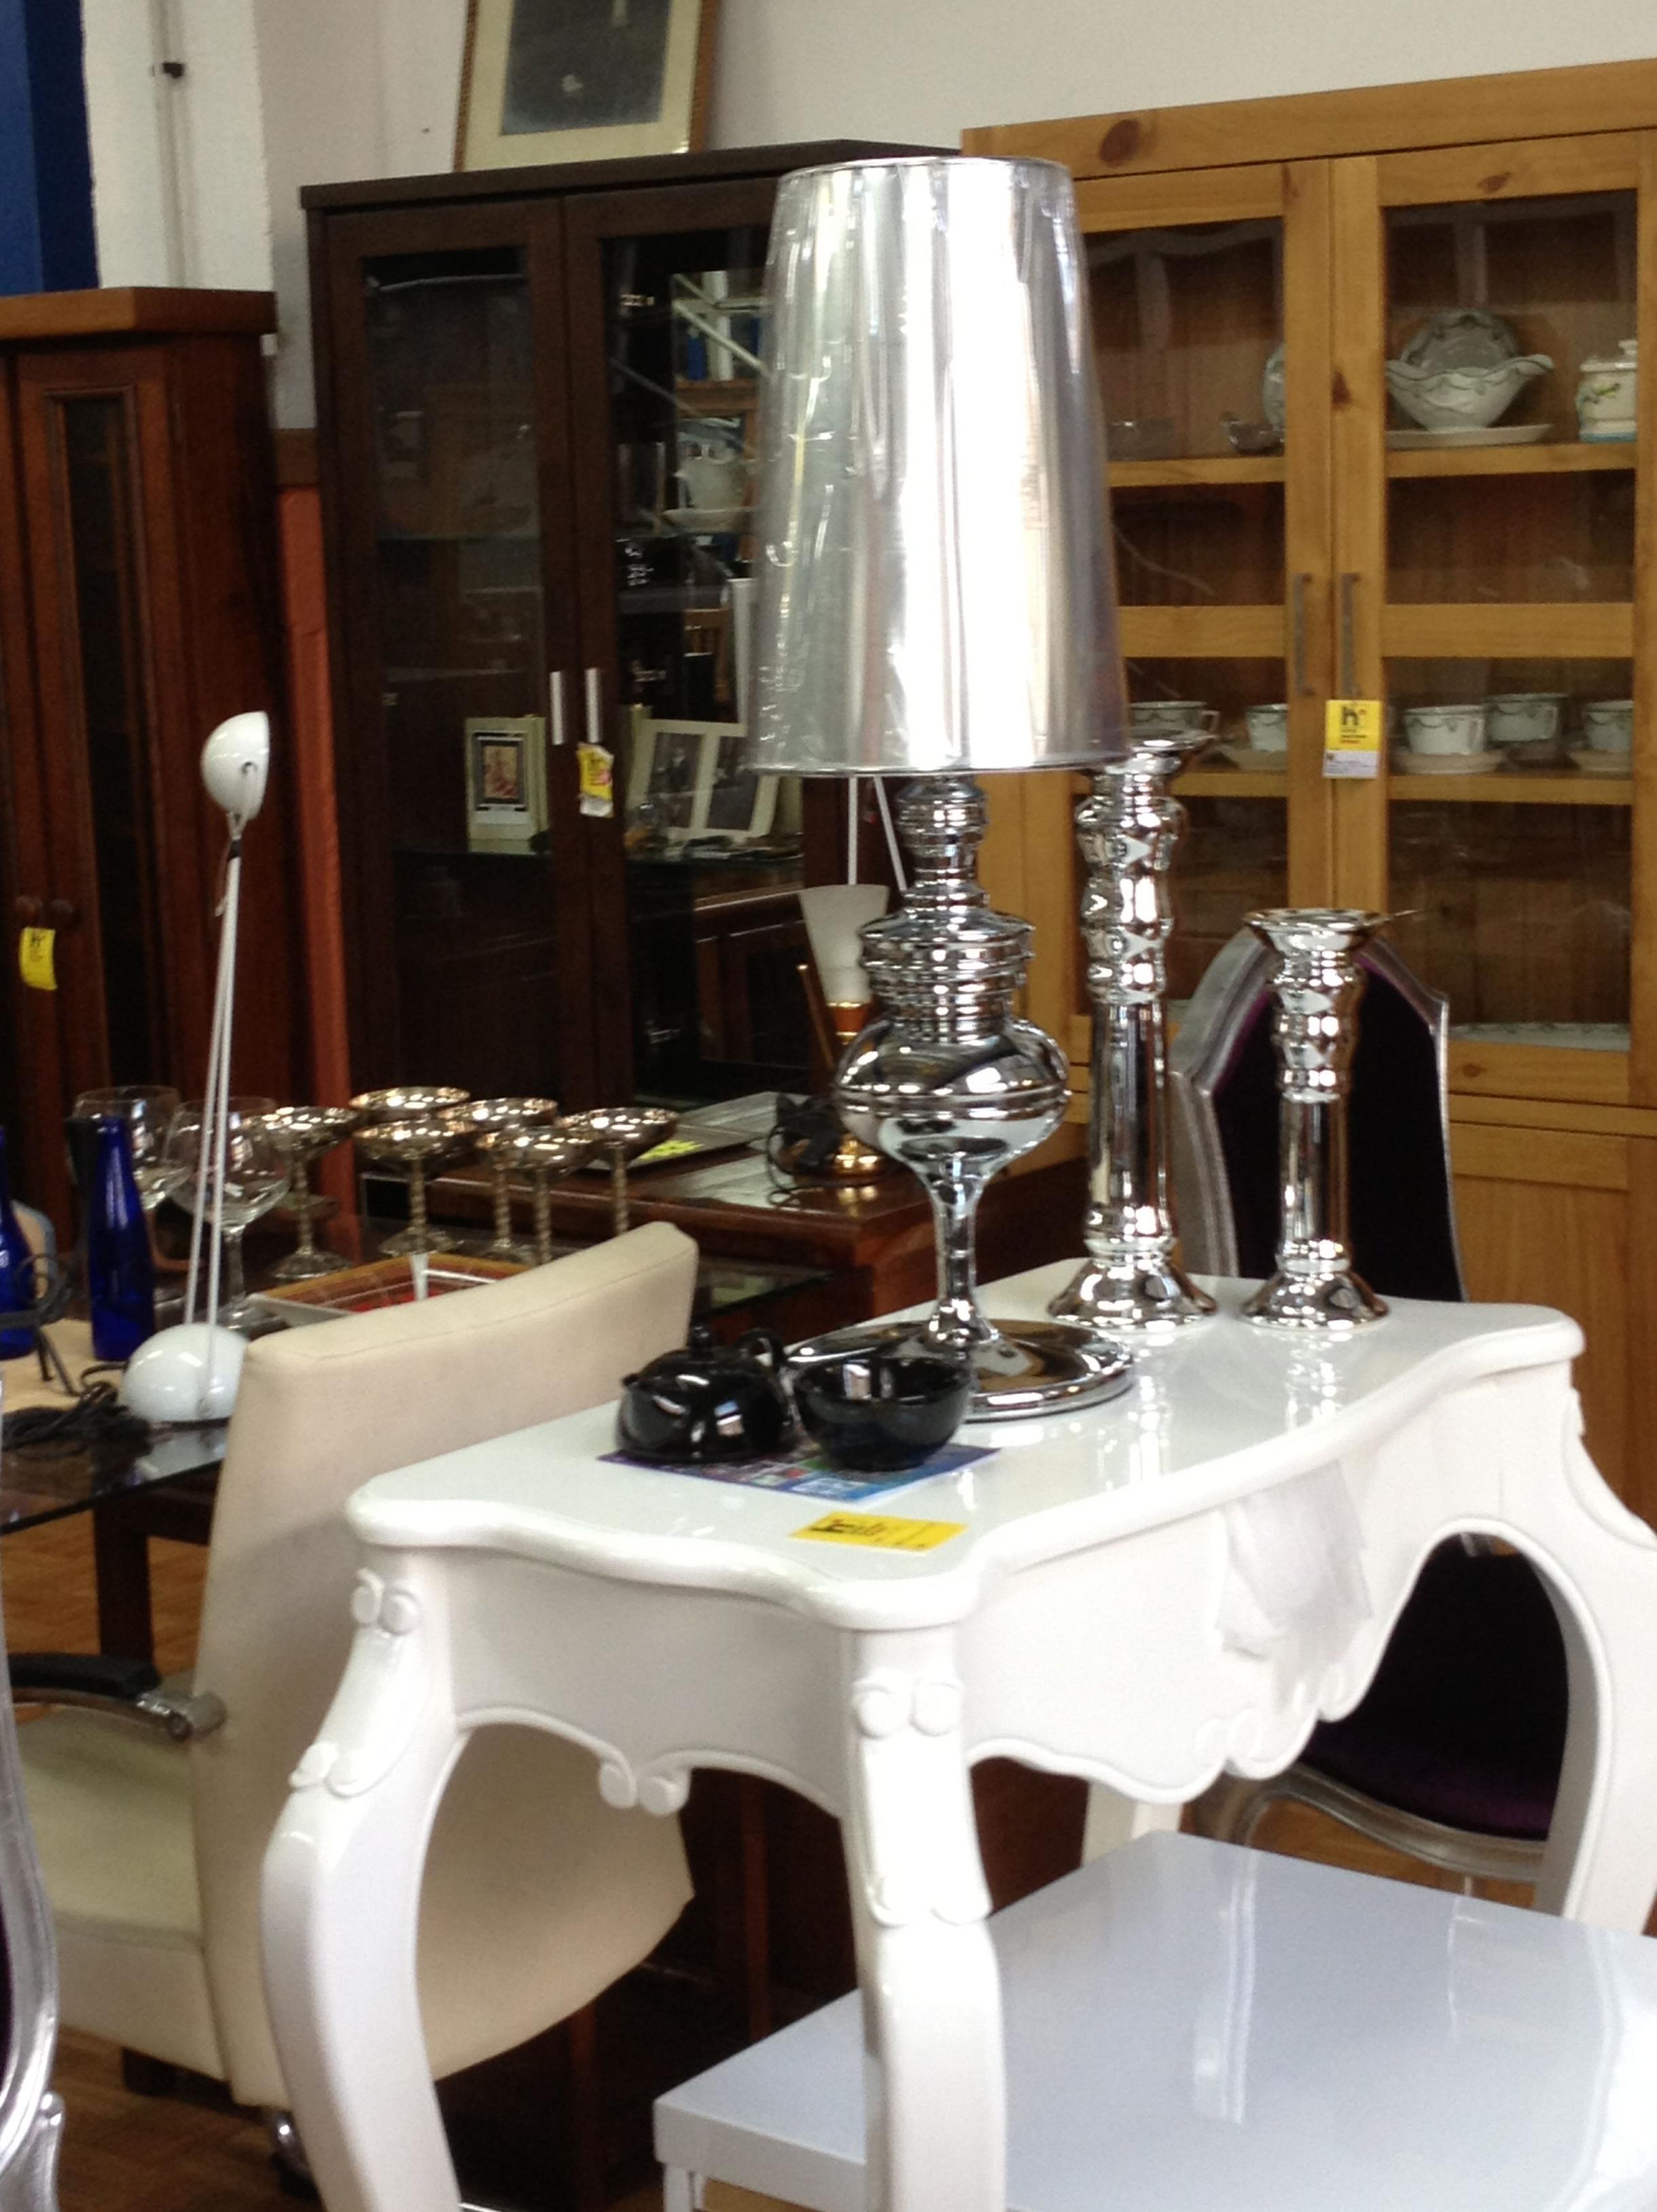 Muebles Segunda Mano Bizkaia Dormitorio De Matrimonio With  # Muebles Bizkaia